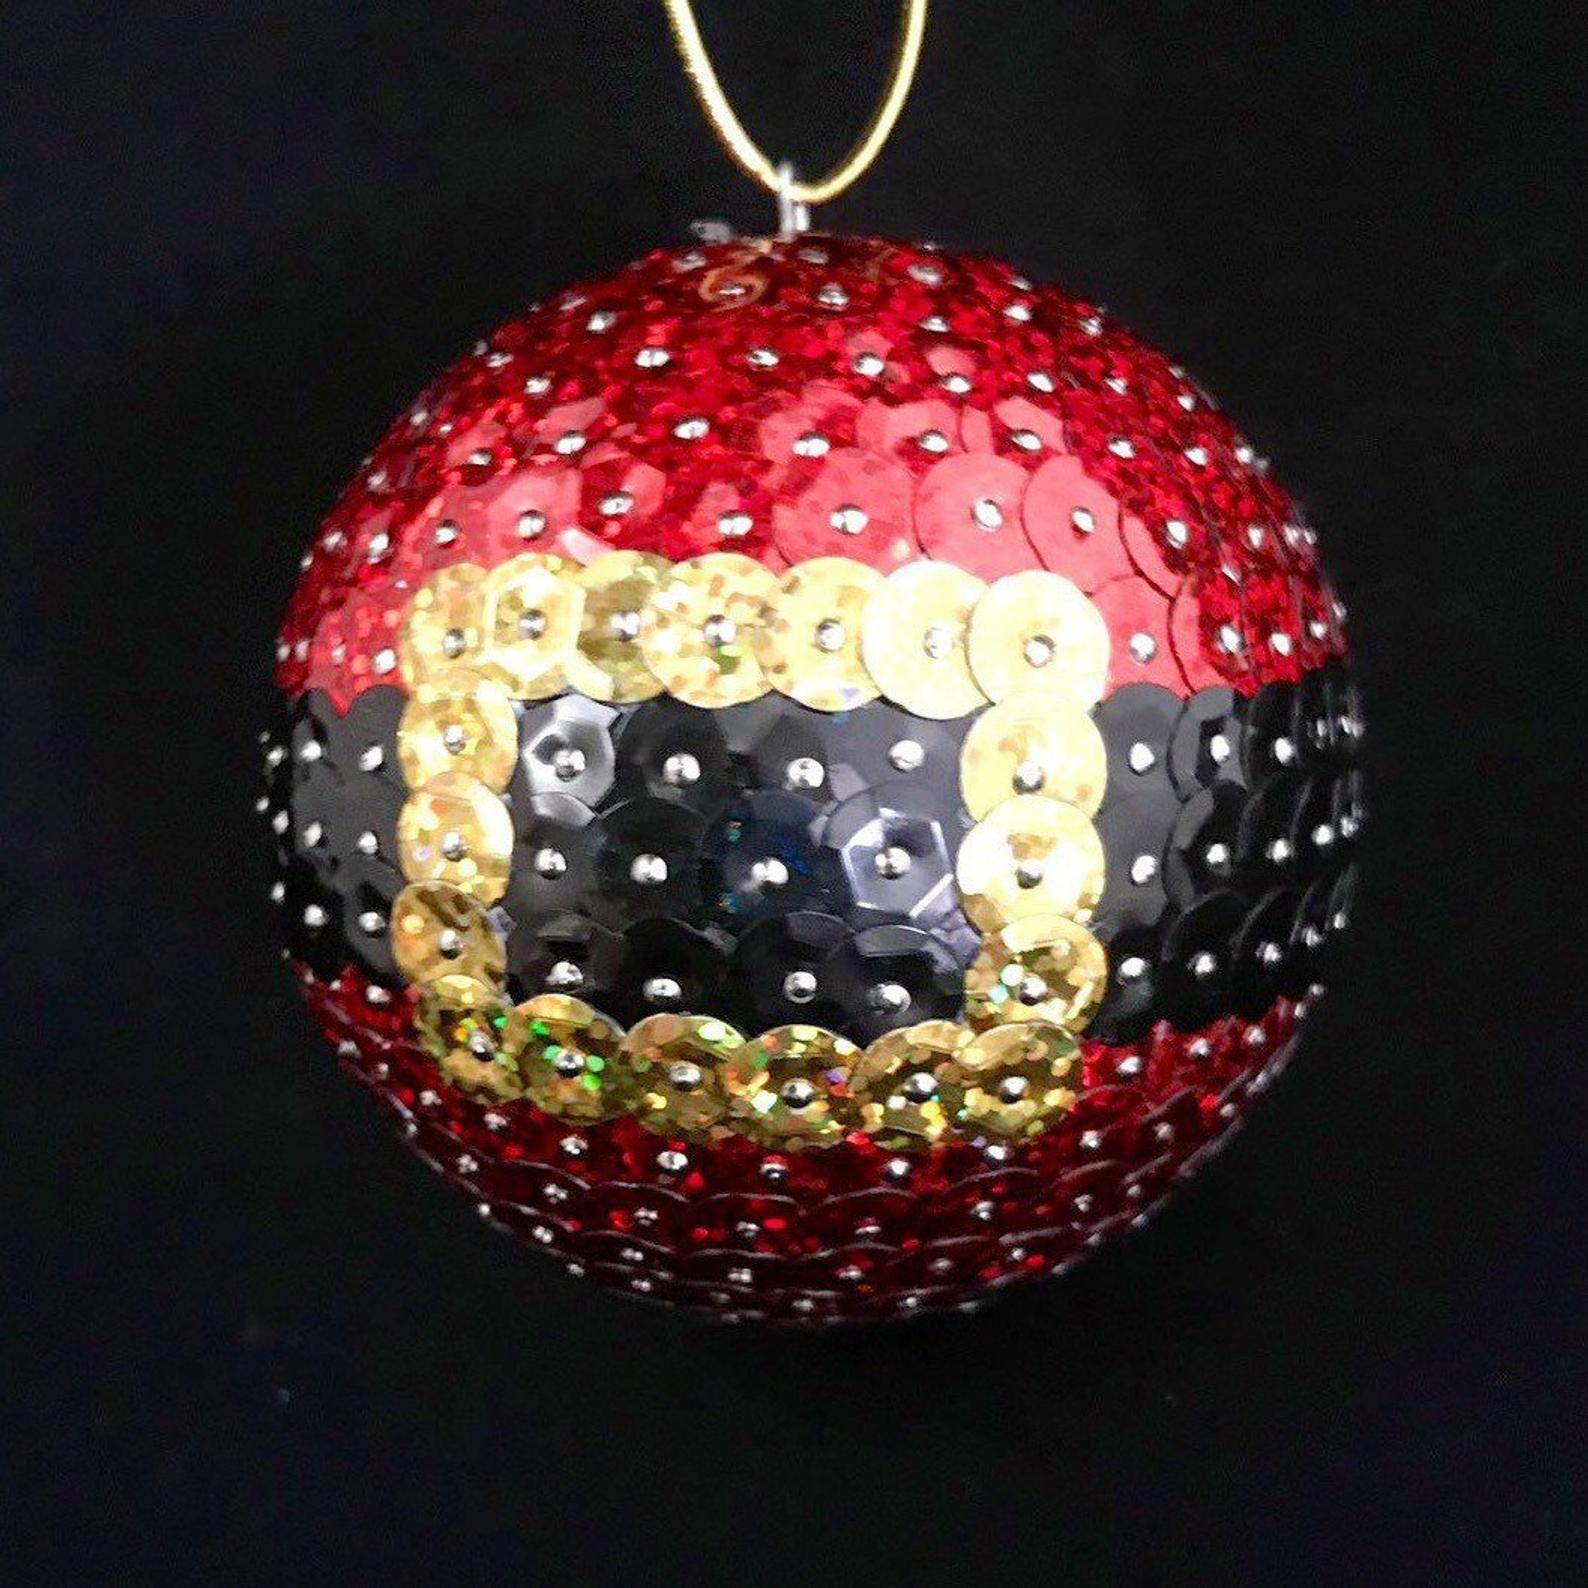 Sequin Santa Belt Christmas Ornament Available In 3 Or 2 5 Handmade Christmas Ornaments Christmas Ornament Crafts Christmas Ornaments